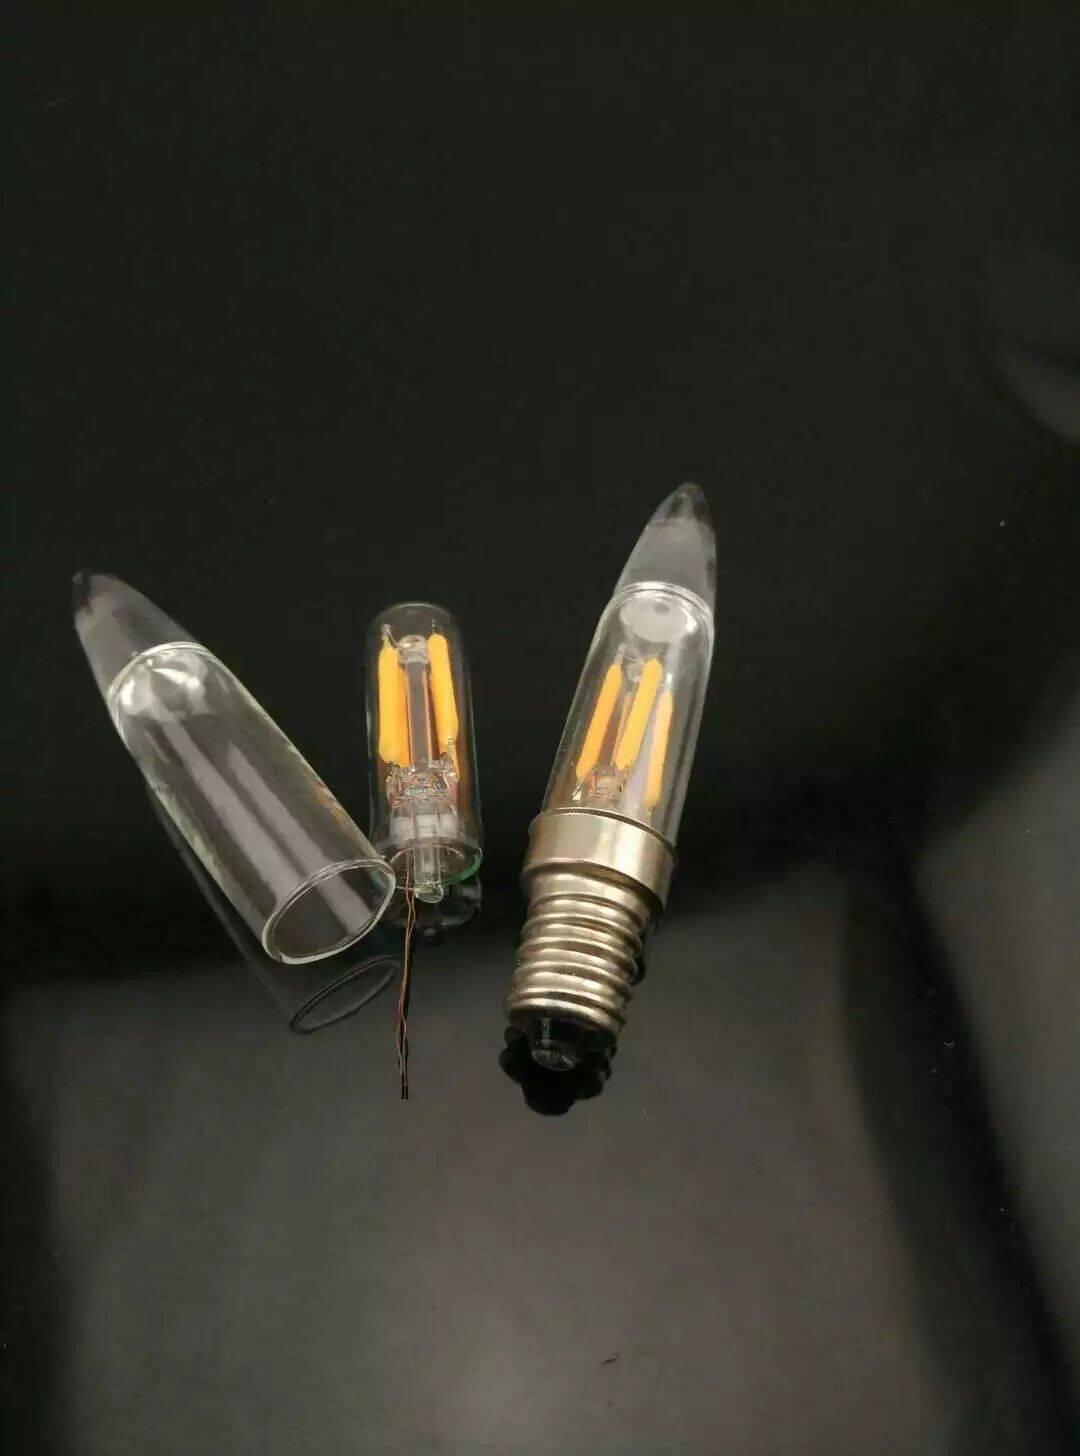 Torpedo candle led bulb 2W E14 bullet shape led bulb